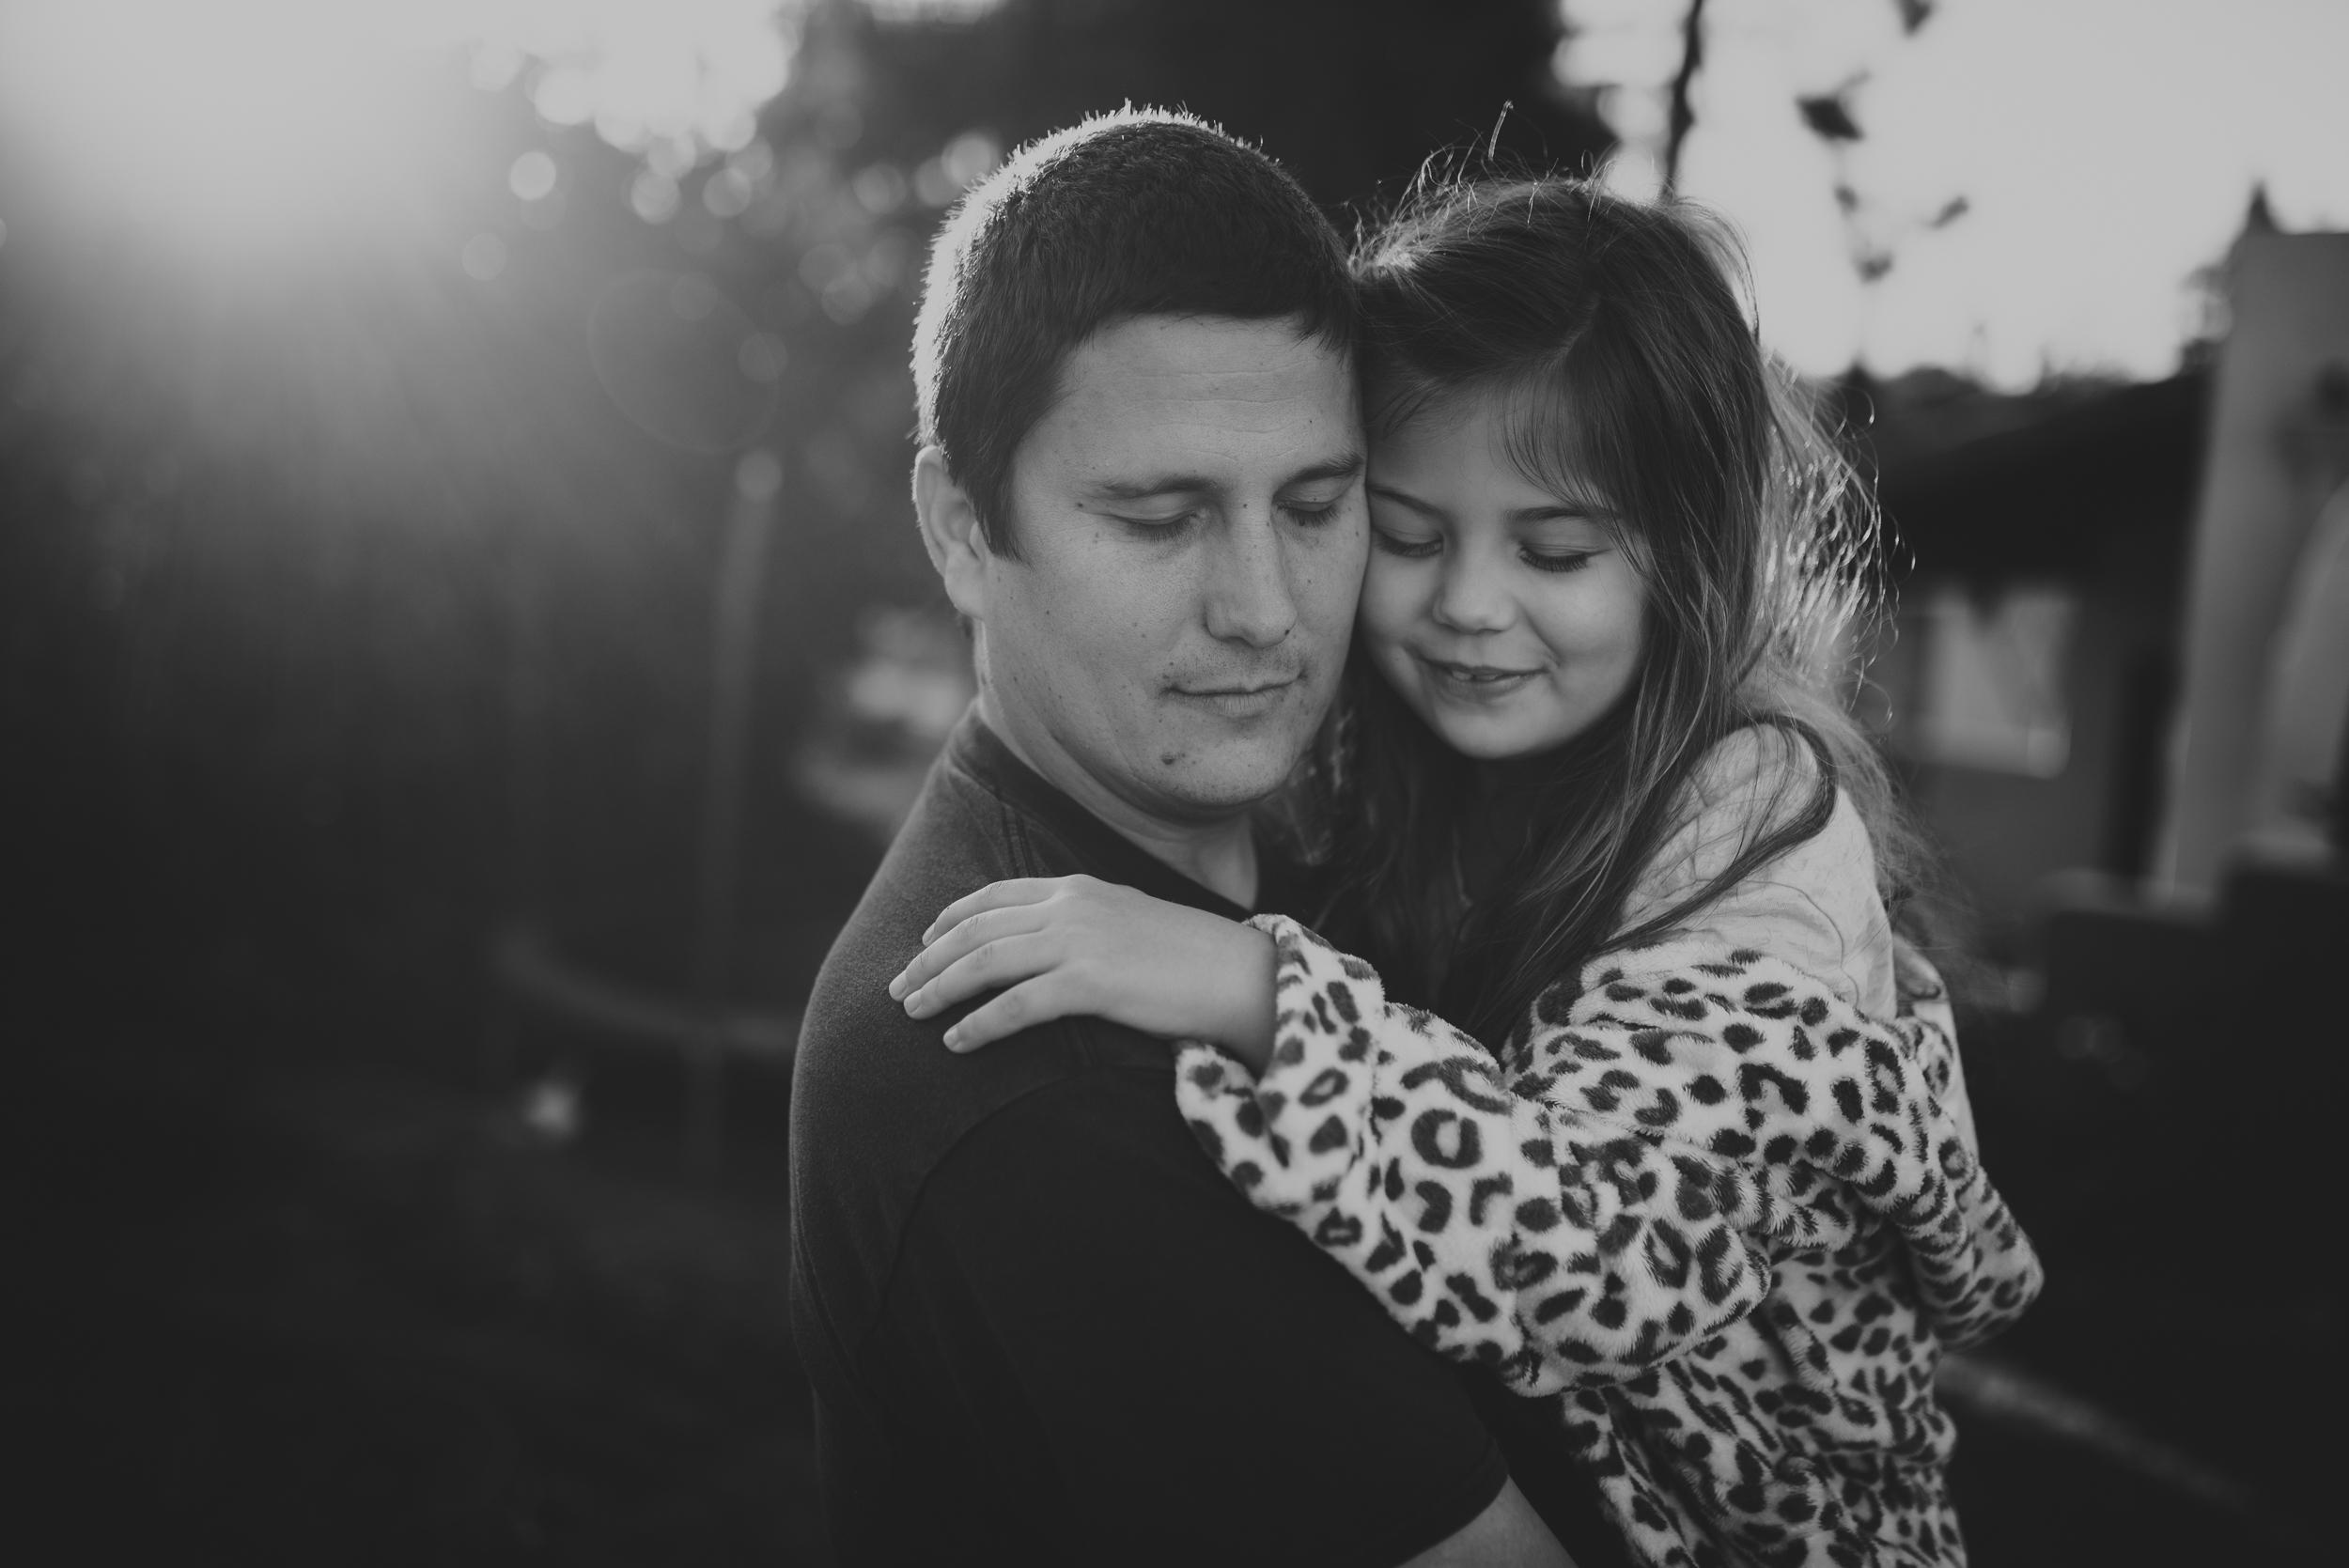 2018-San-Diego-Family-Lifestyle-Newborn-Travel-Vacation-Photographer-Kelsey-Smith-Photography-Coronado-La-Jolla-Encinitas-Solana-Beach-Del-Mar-273.jpg